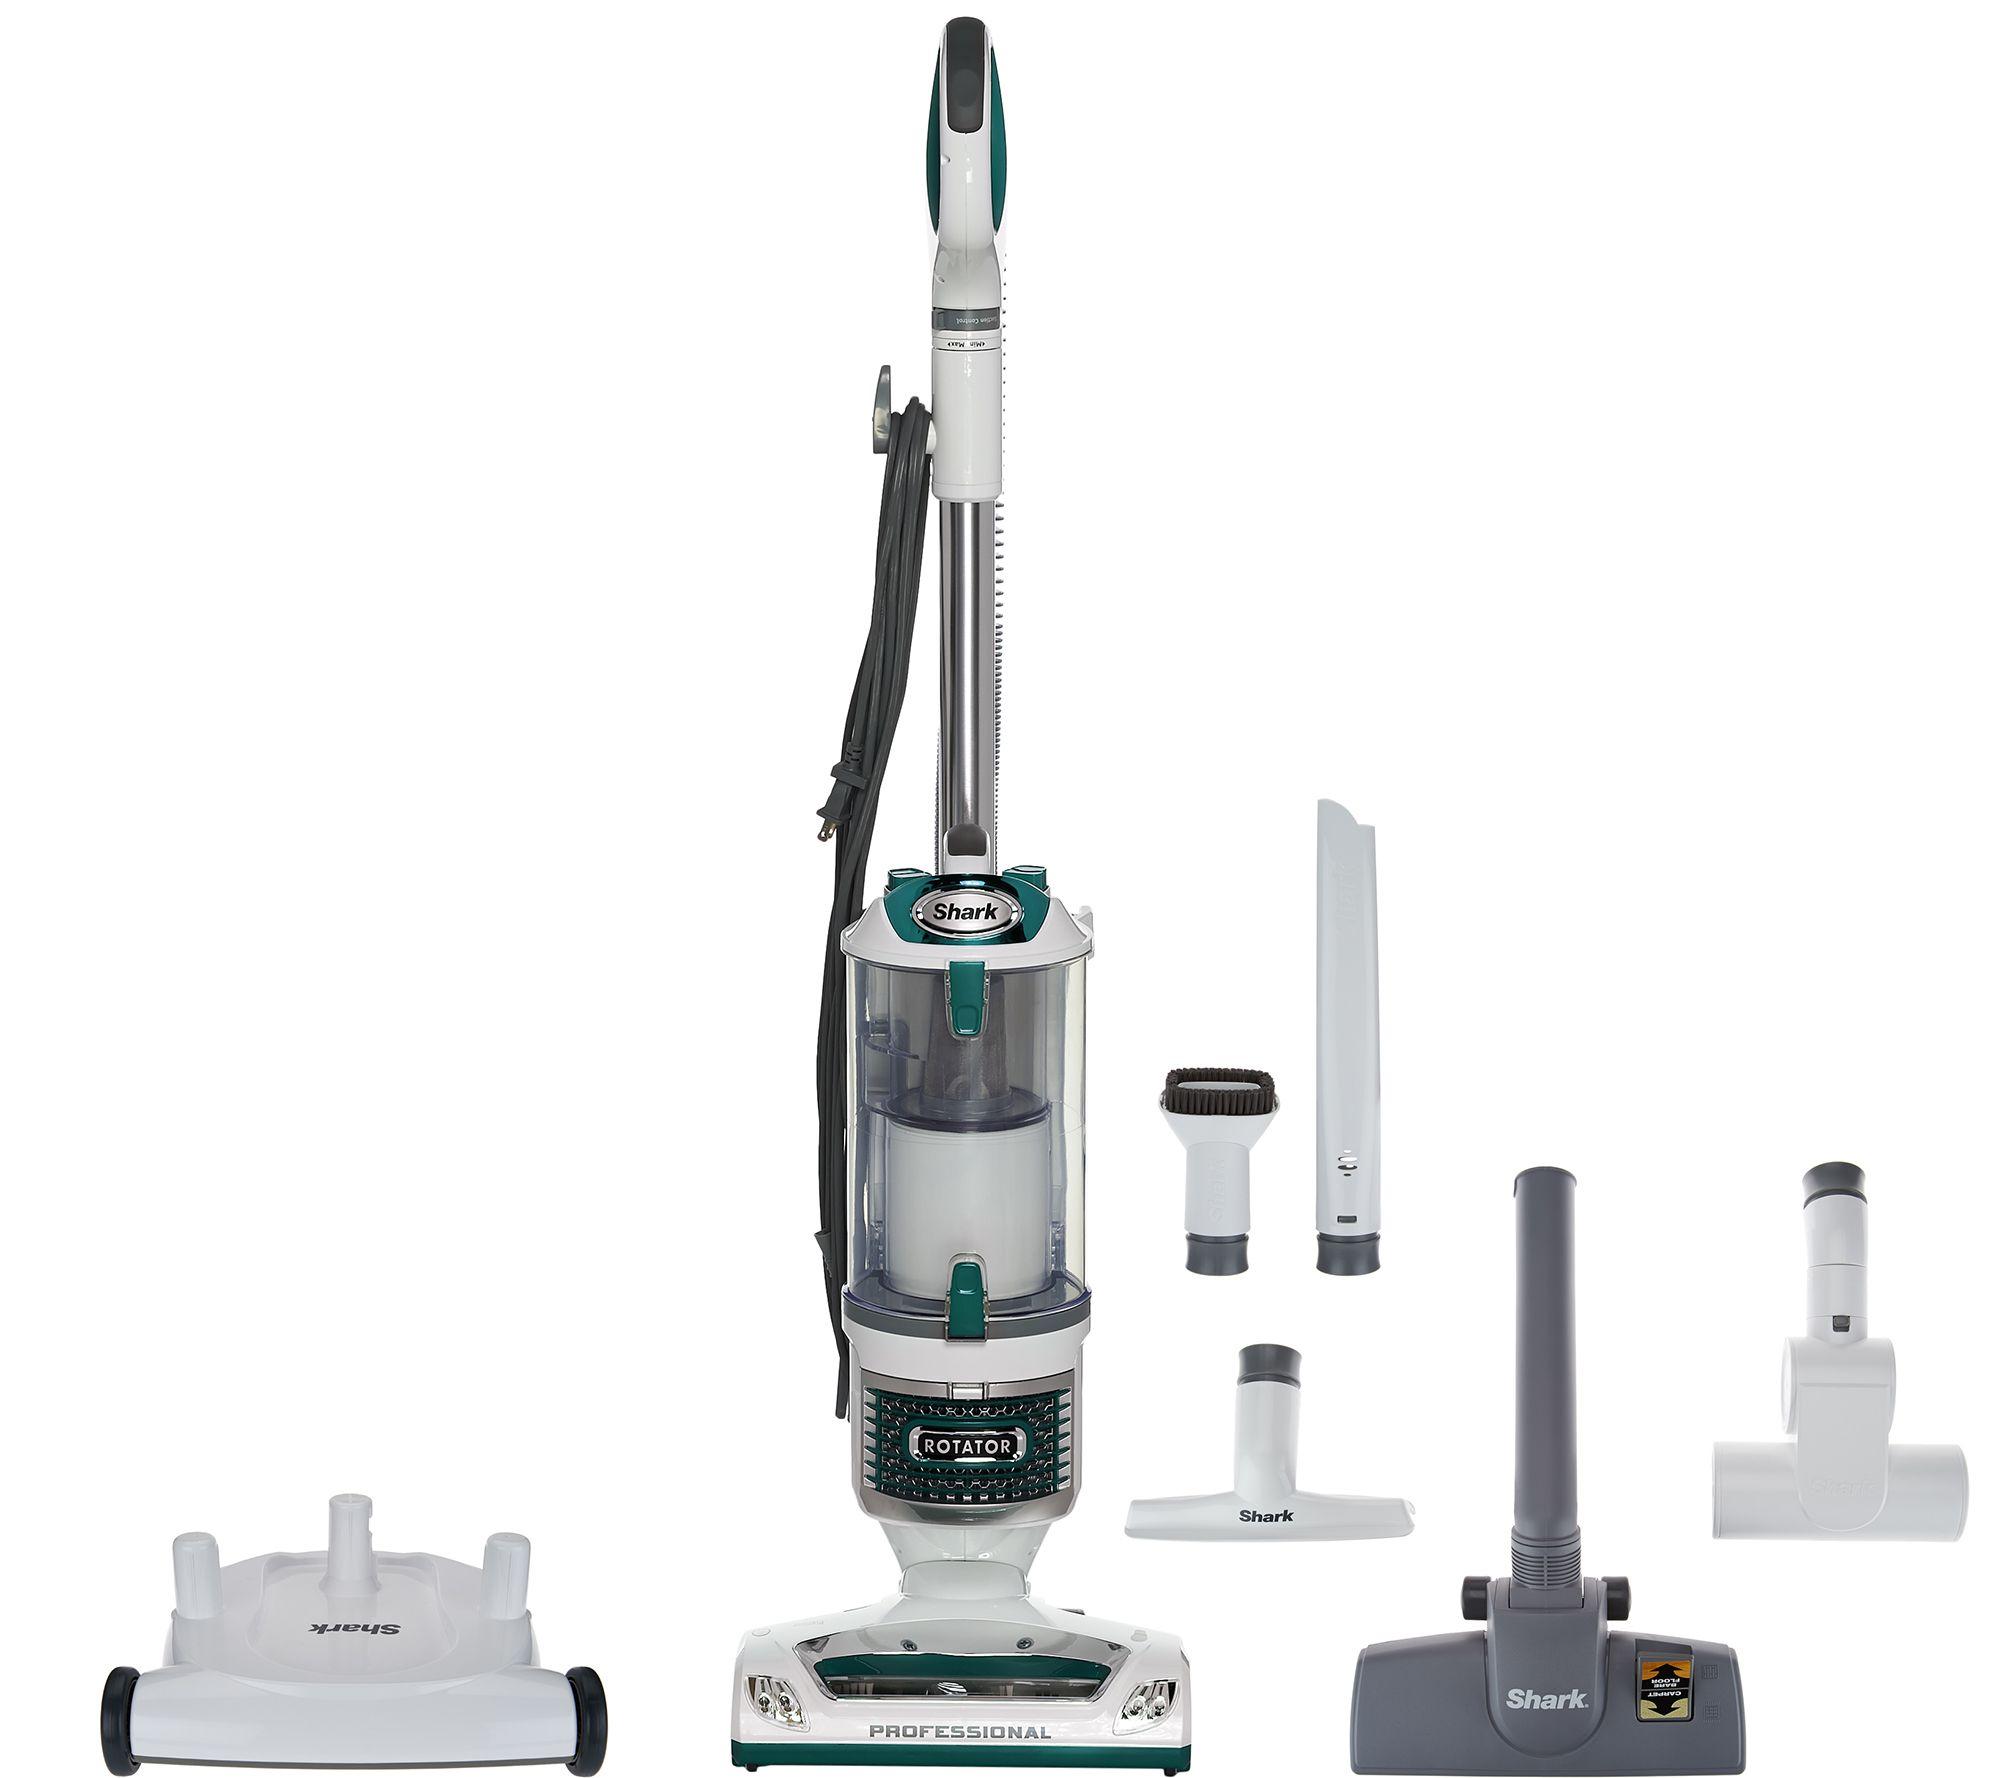 Shark navigator vacuum cleaner big w - Shark Rotator Professional 3 In 1 Liftaway Upright Vacuum W Caddy Tools Page 1 Qvc Com